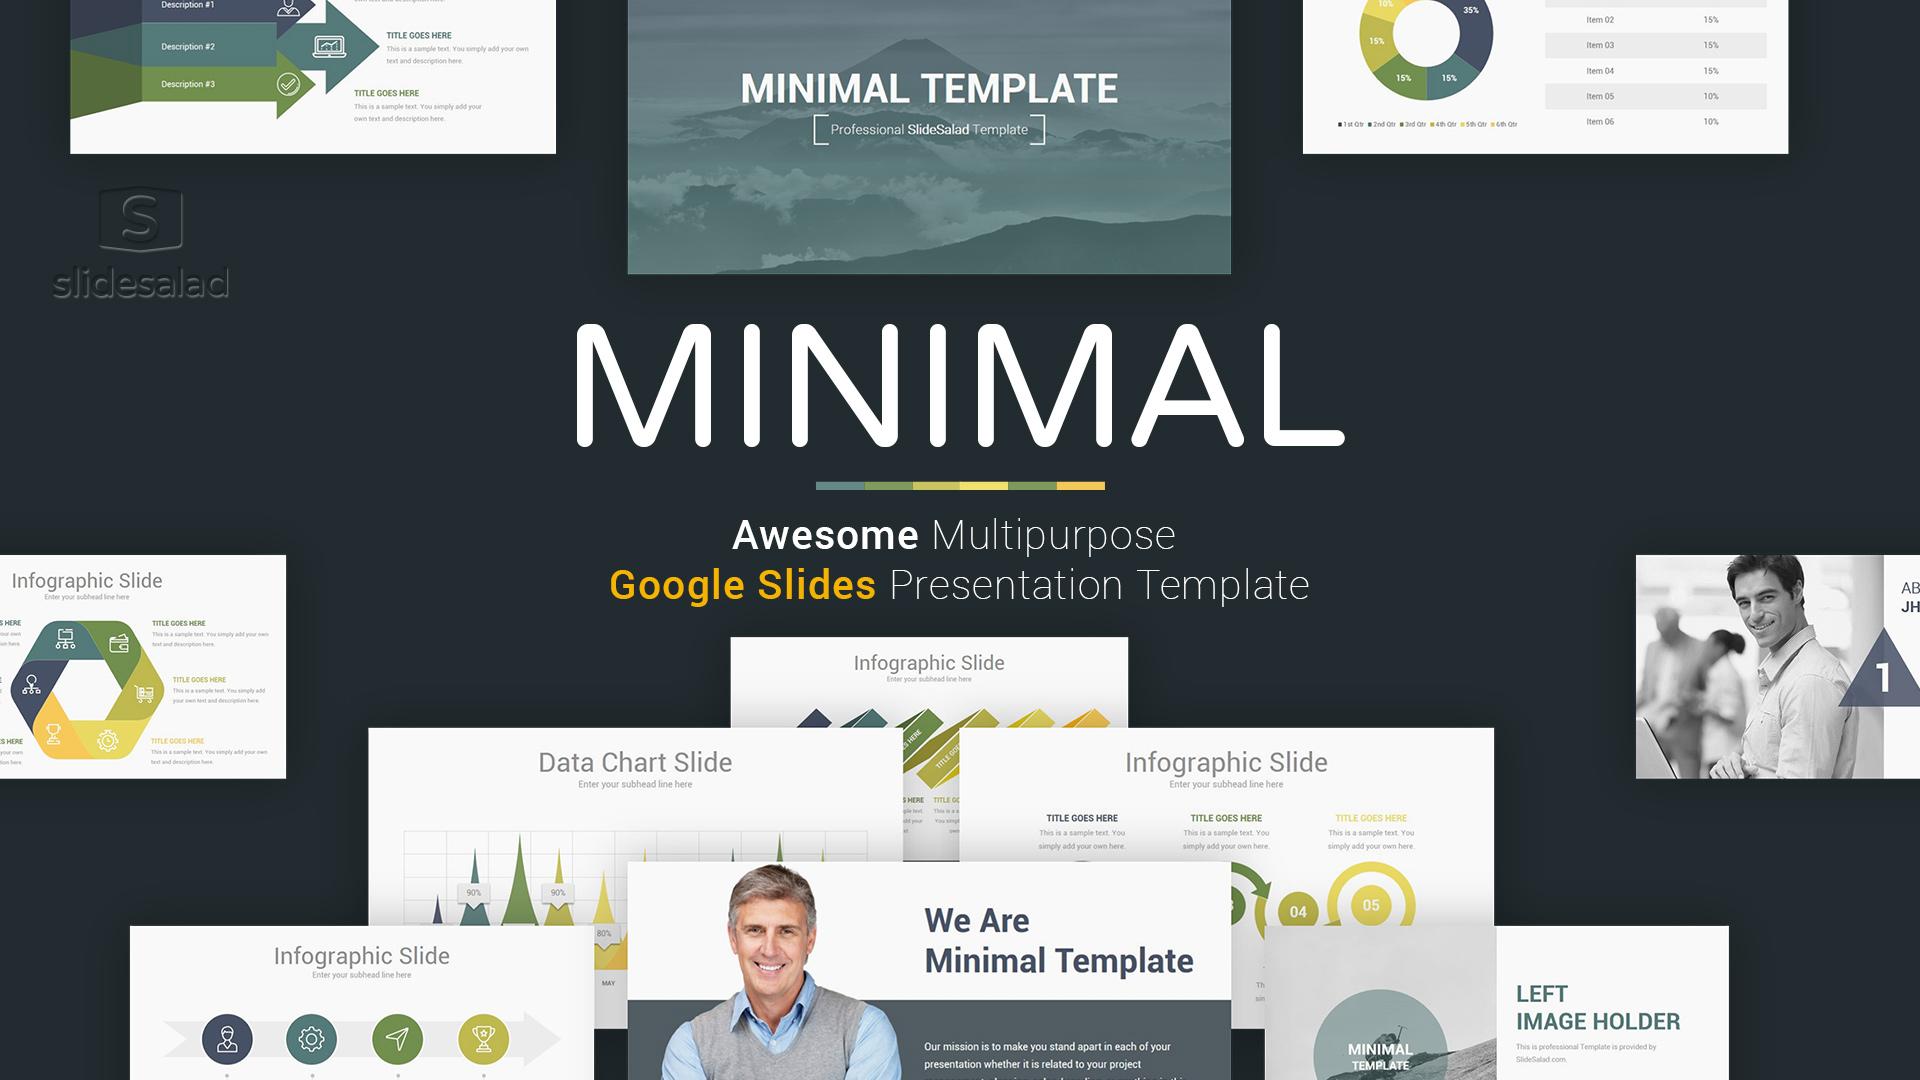 Professional Minimalist Google Slides Presentation Template – Fully Editable Google Slides Theme for Business Presentations